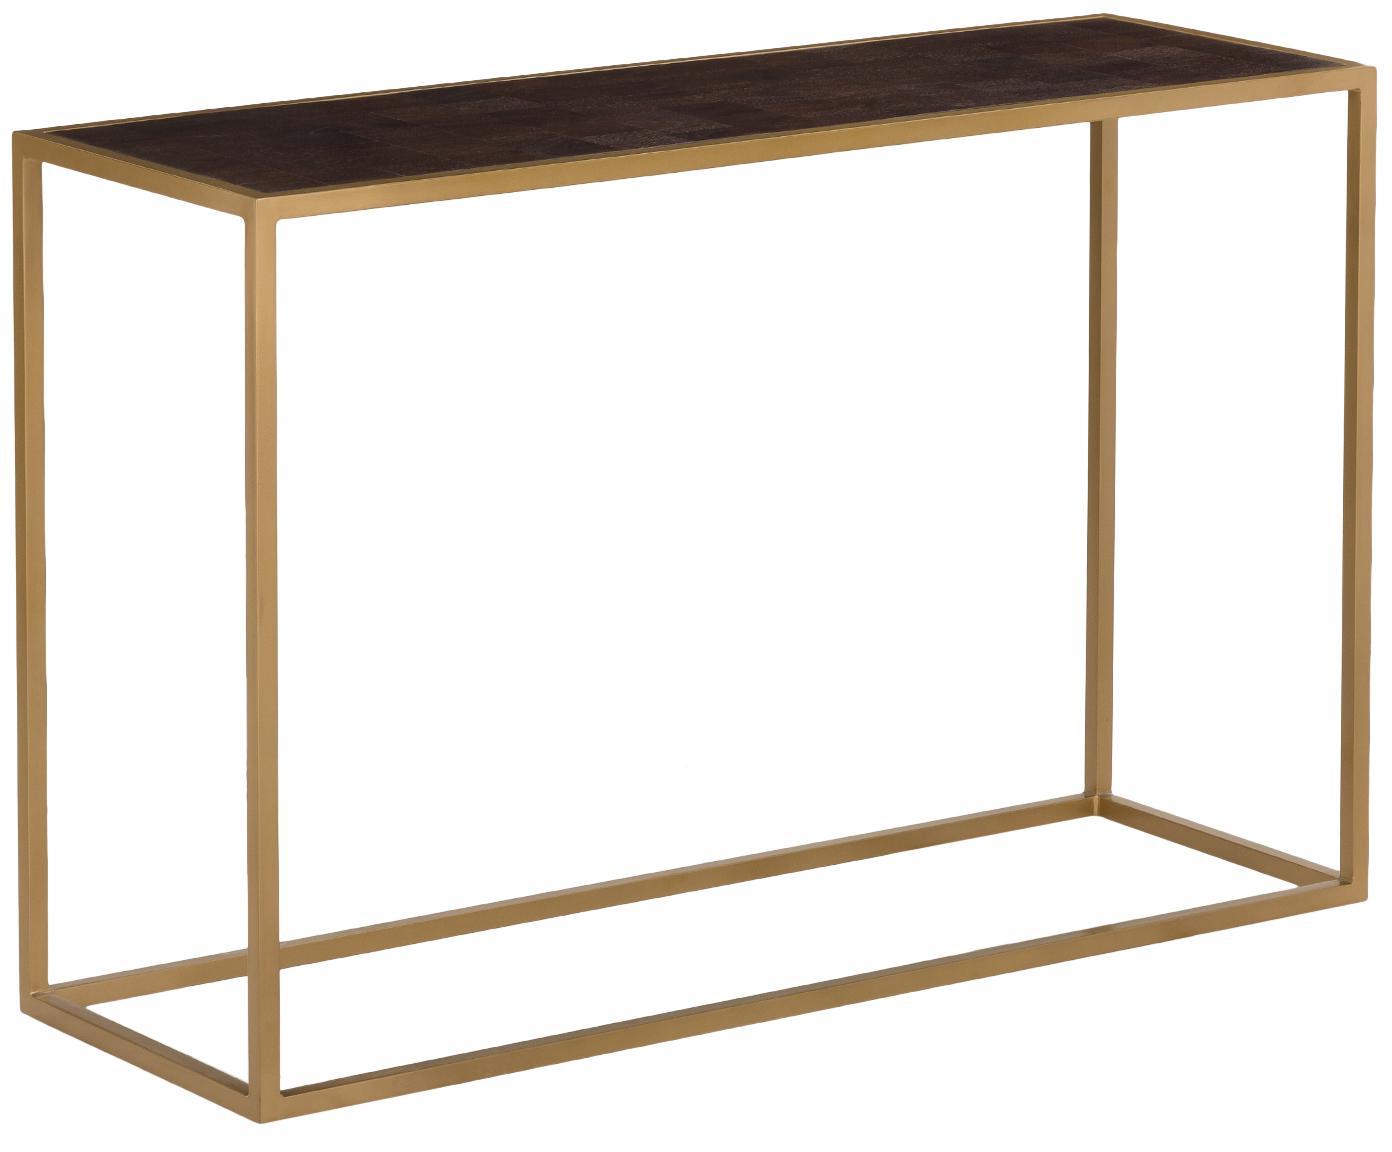 Sidetable James met goudkleurige frame, Tafelblad: gelakt massief mangohout, Frame: gepoedercoat metaal, Tafelblad: donker gelakt mangohout. Frame: mat goudkleurig, 120 x 78 cm